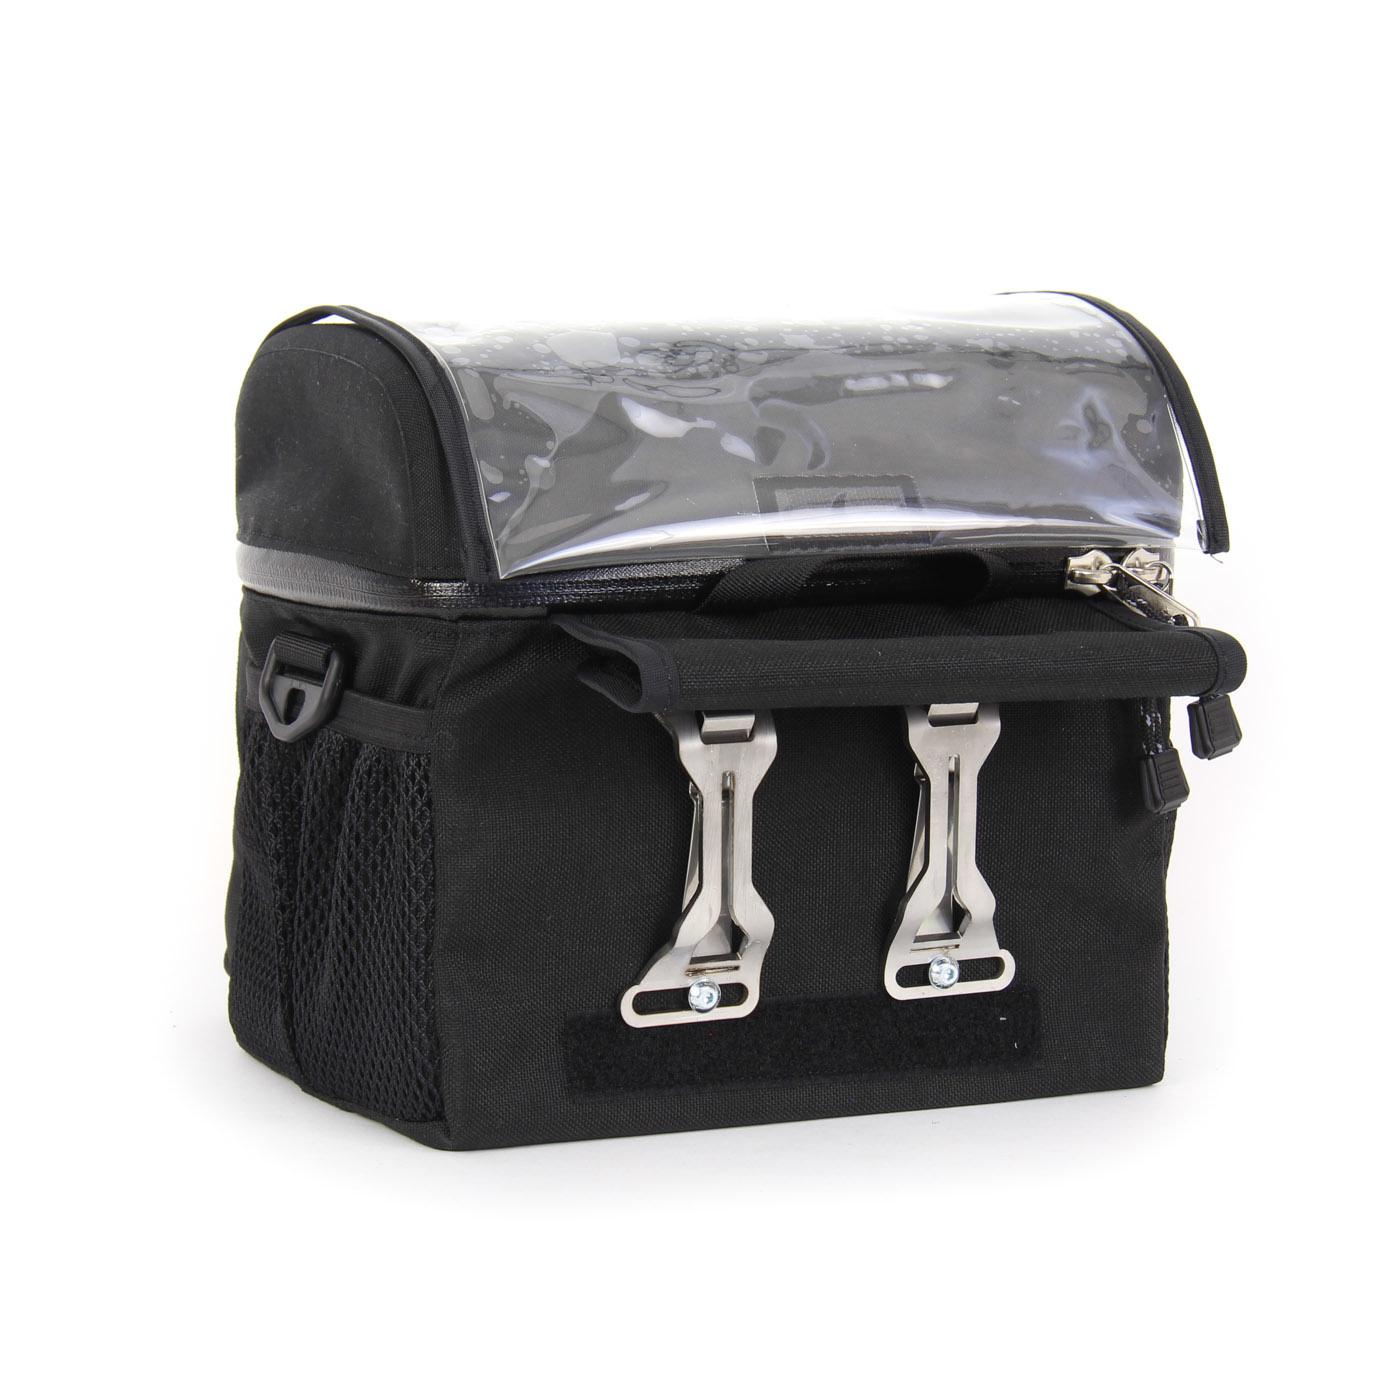 Arkel Arkel Handlebar Bag, Small, Black